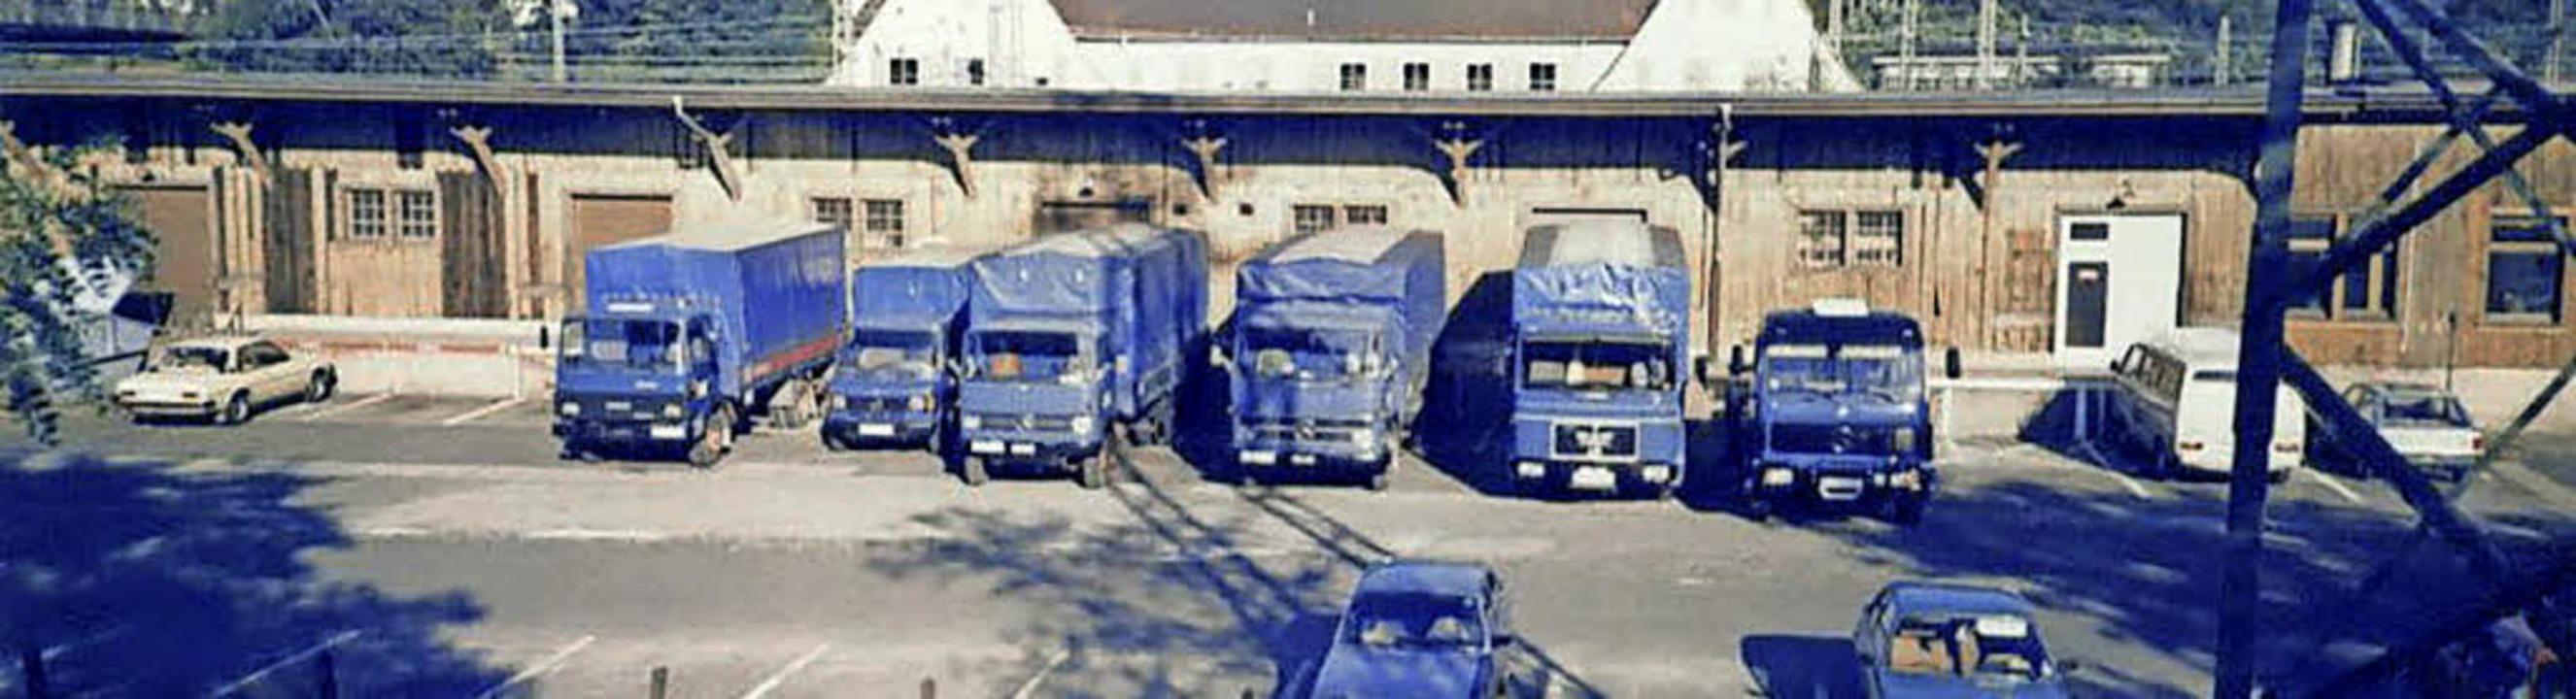 Als offizielles Rollfuhrunternehmen de... früheren Weiler Güterbahnhof ankamen.  | Foto: Reinhold Utke